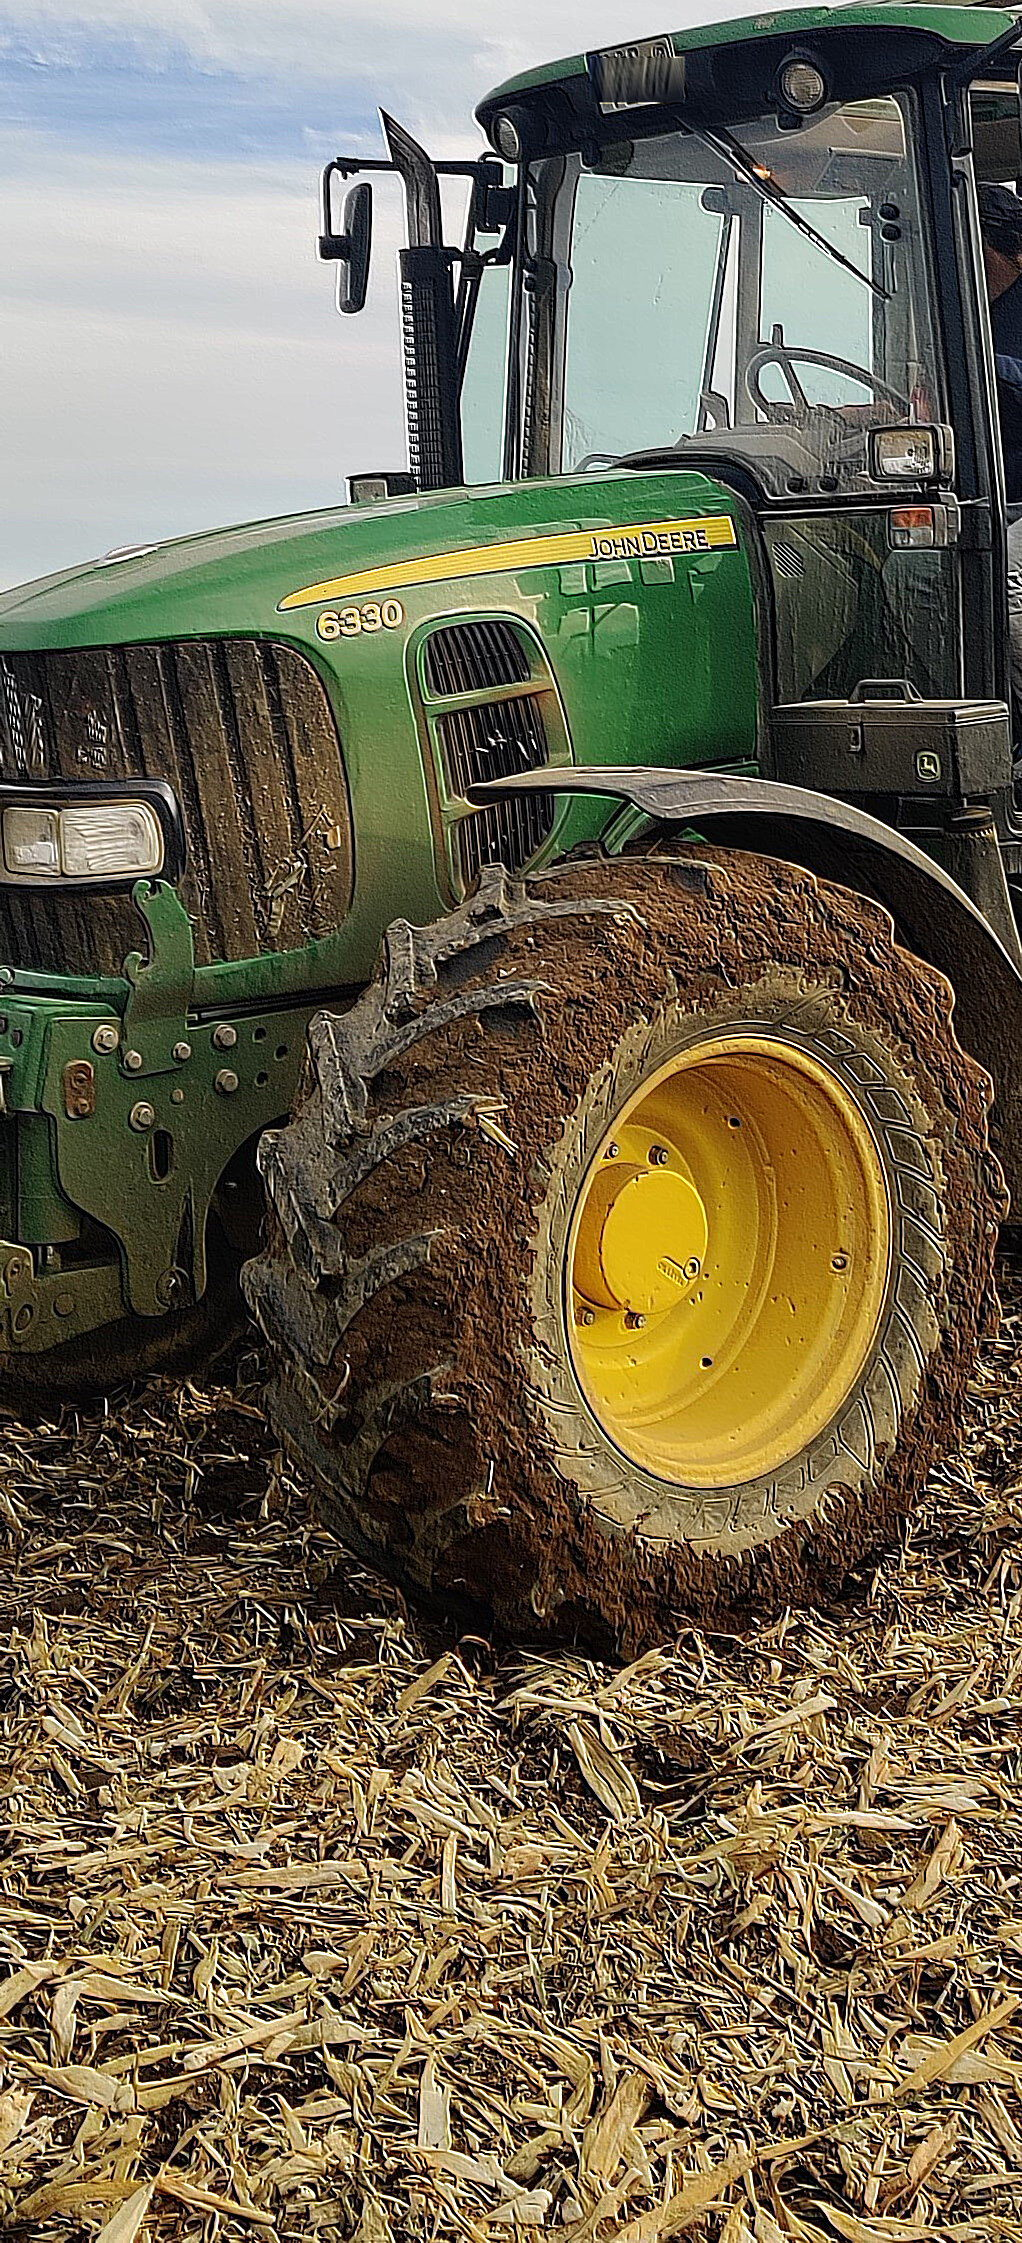 steinherr-landtechnik-sainbach-traktor-vorderrad-2-2020